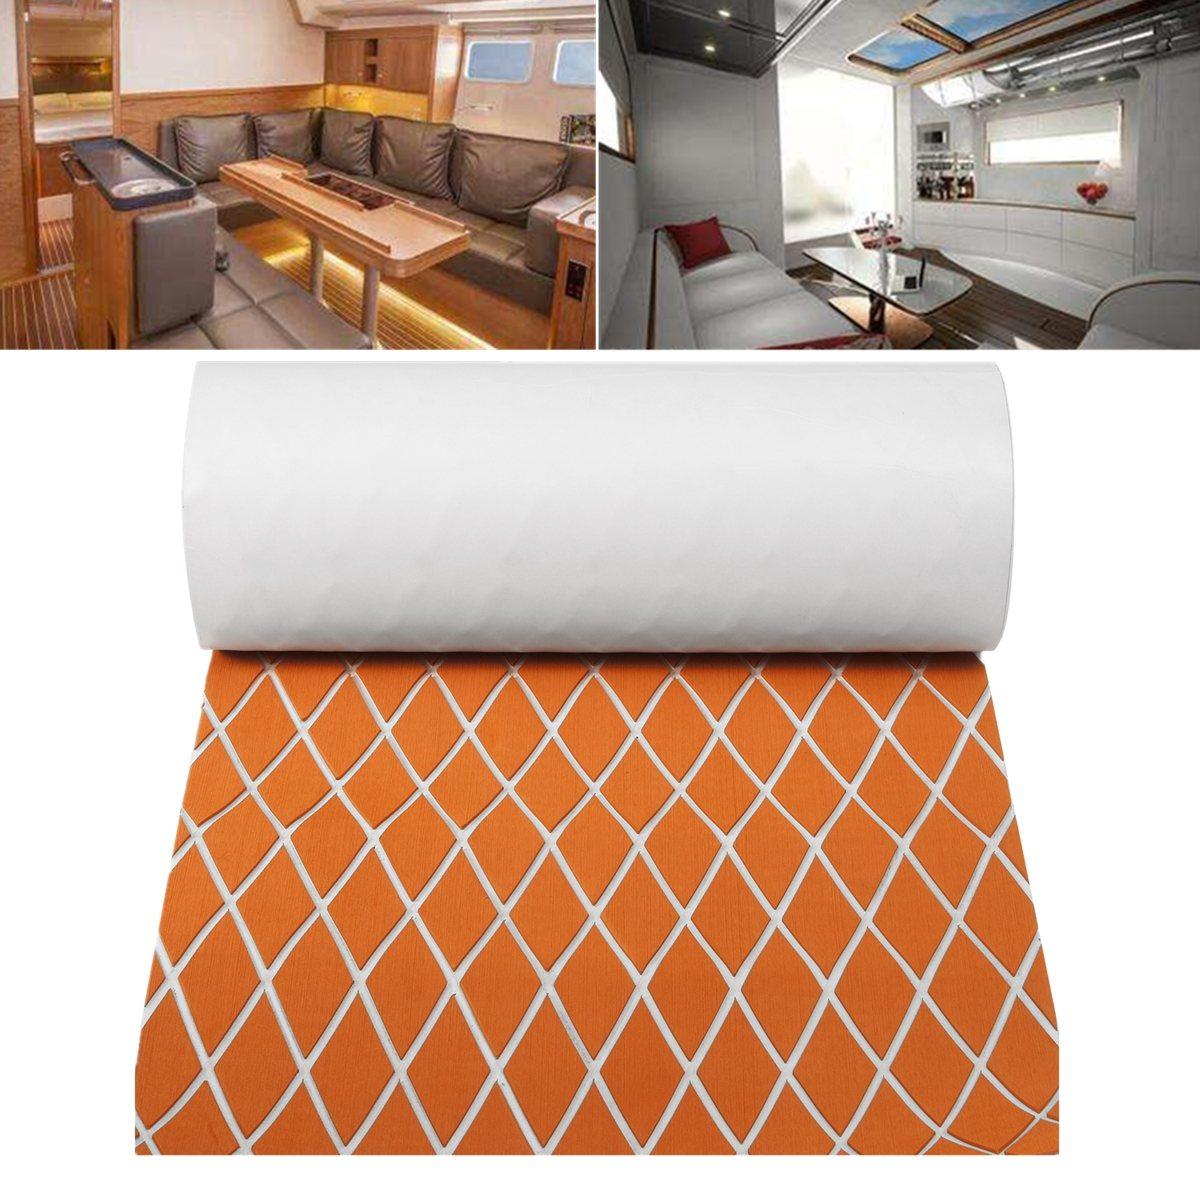 60CMx190CM EVA Foam Marine Teak Sheet <font><b>Flooring</b></font> RV Touring Car Mat Synthetic Boat Orange + White Decking Yacht Pad